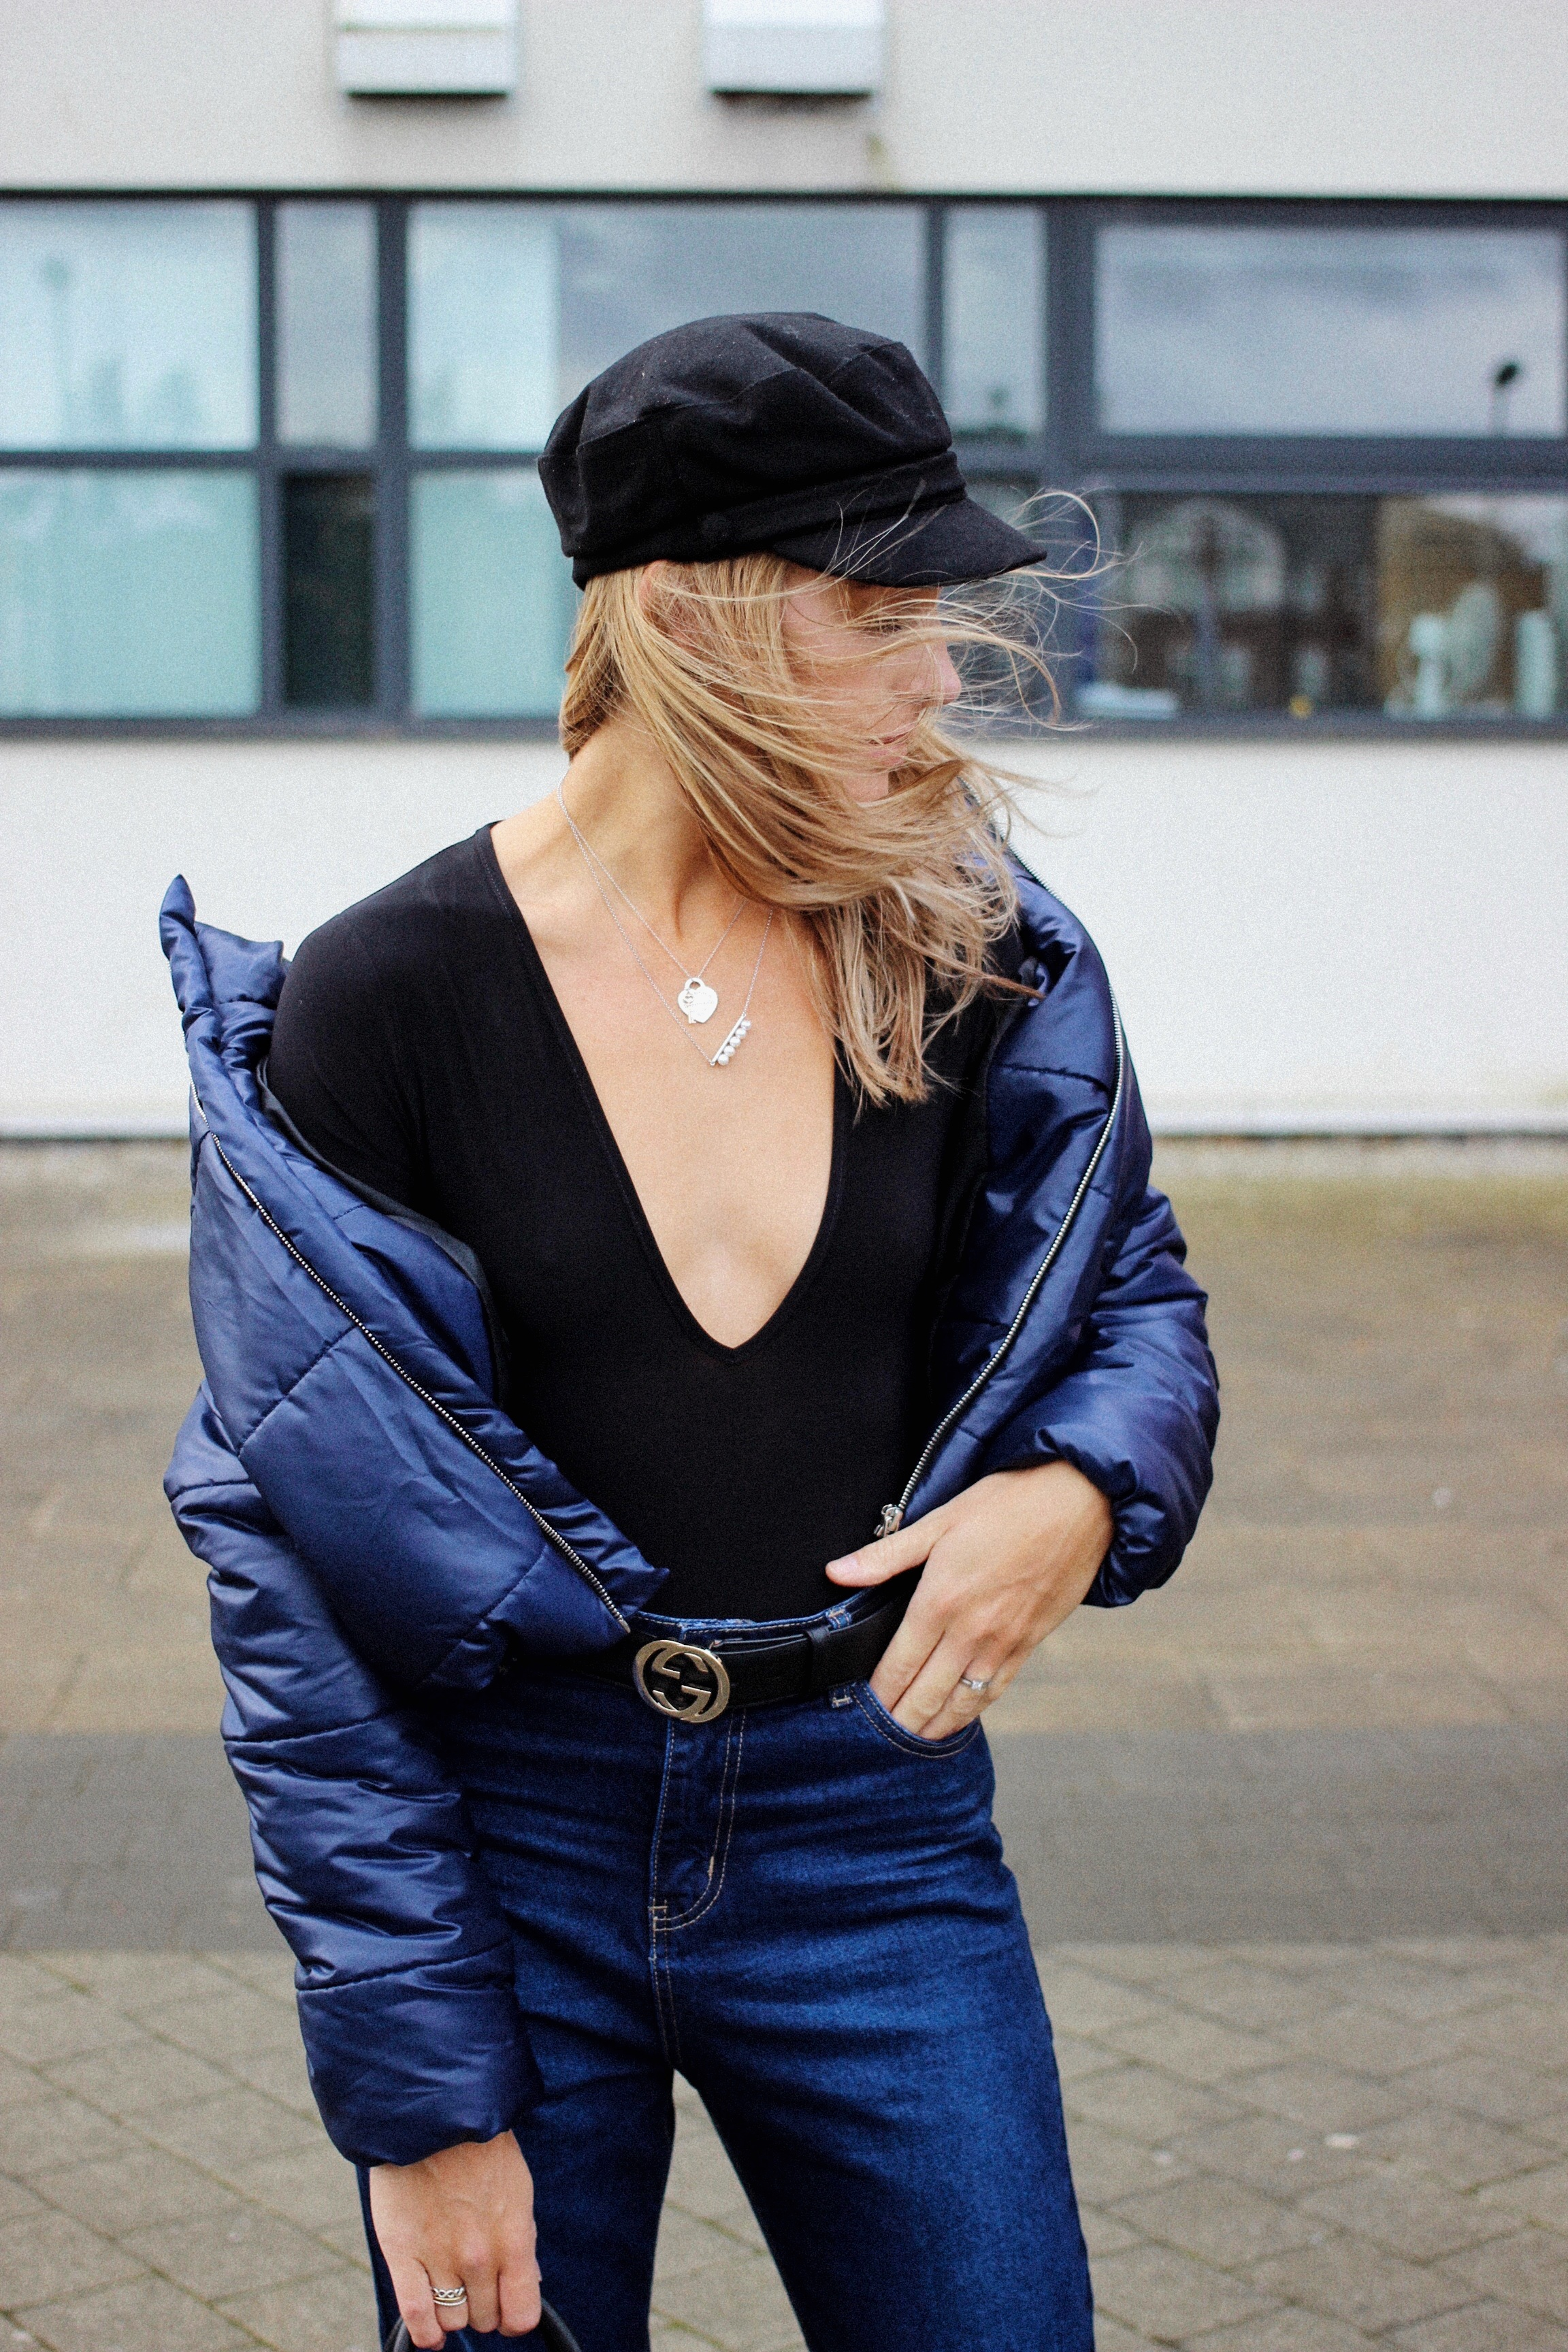 UK high street fashion blogger Charlotte Buttrick from Lurchhoundloves